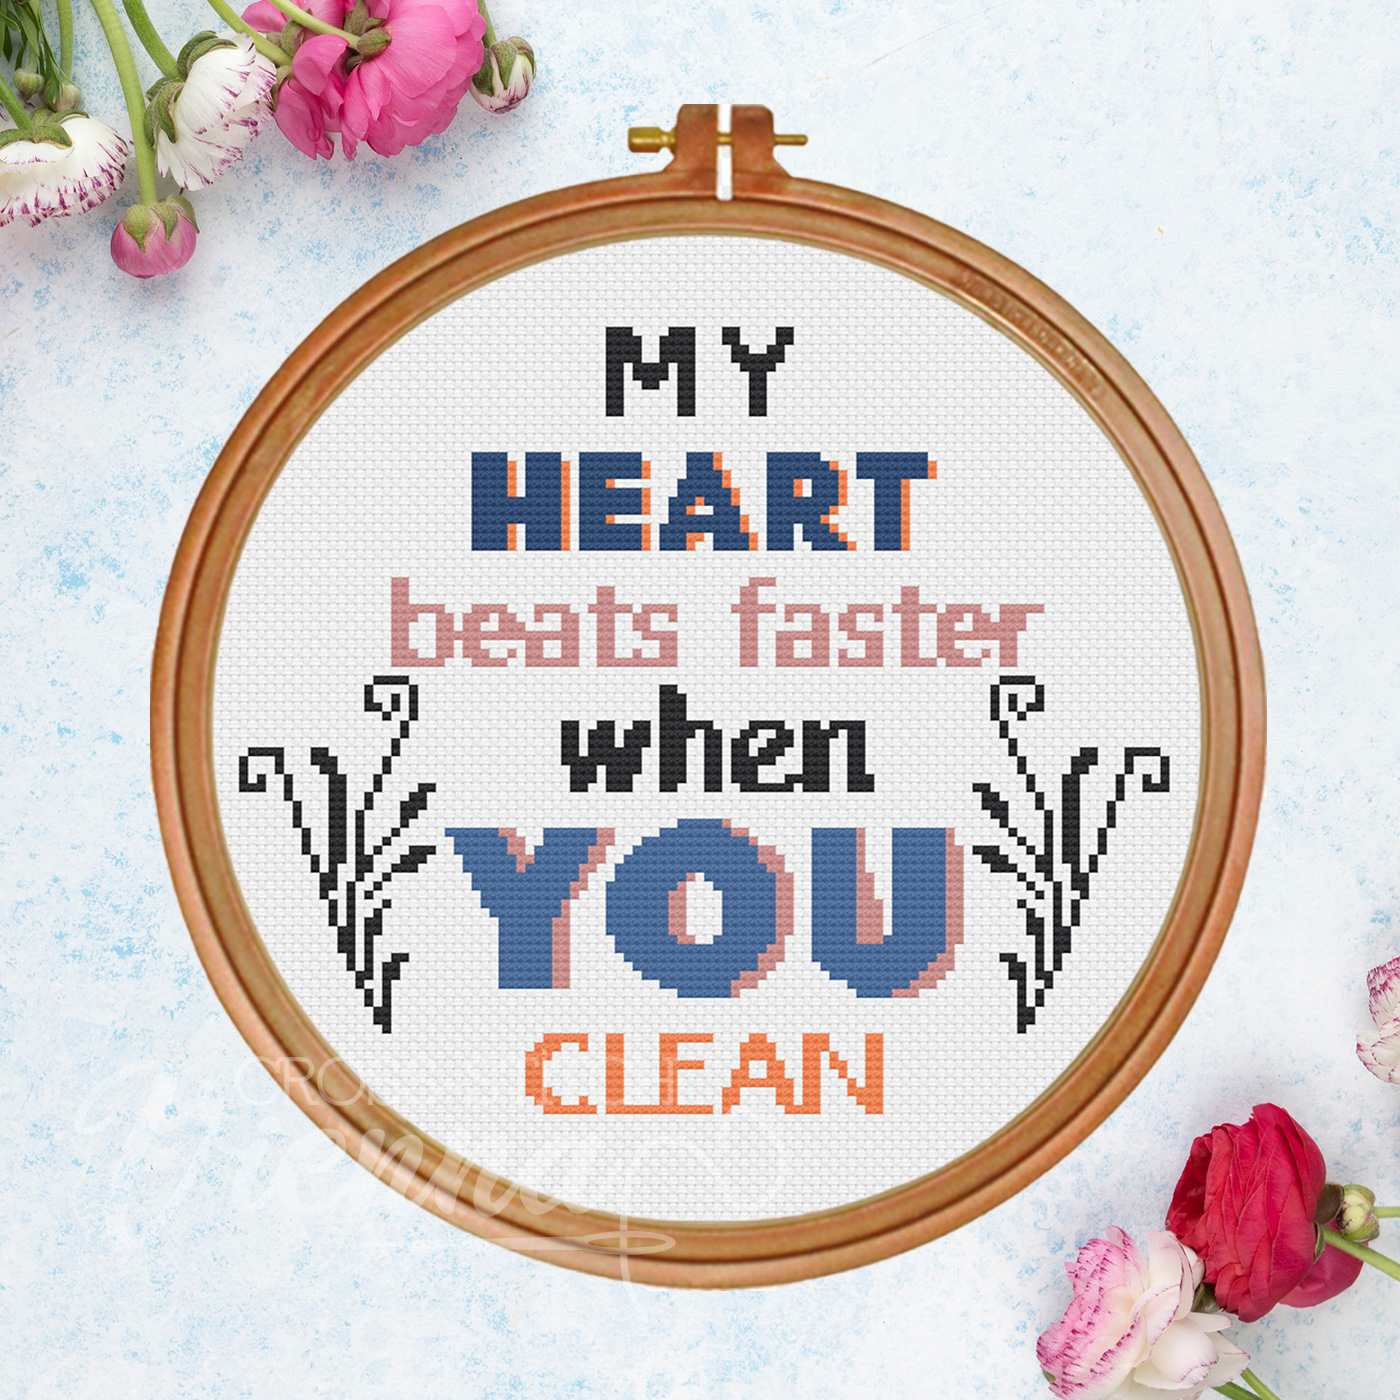 2021-08 Clean Love Cross-Stitch Pattern by Cross-Stitch Vienna sq